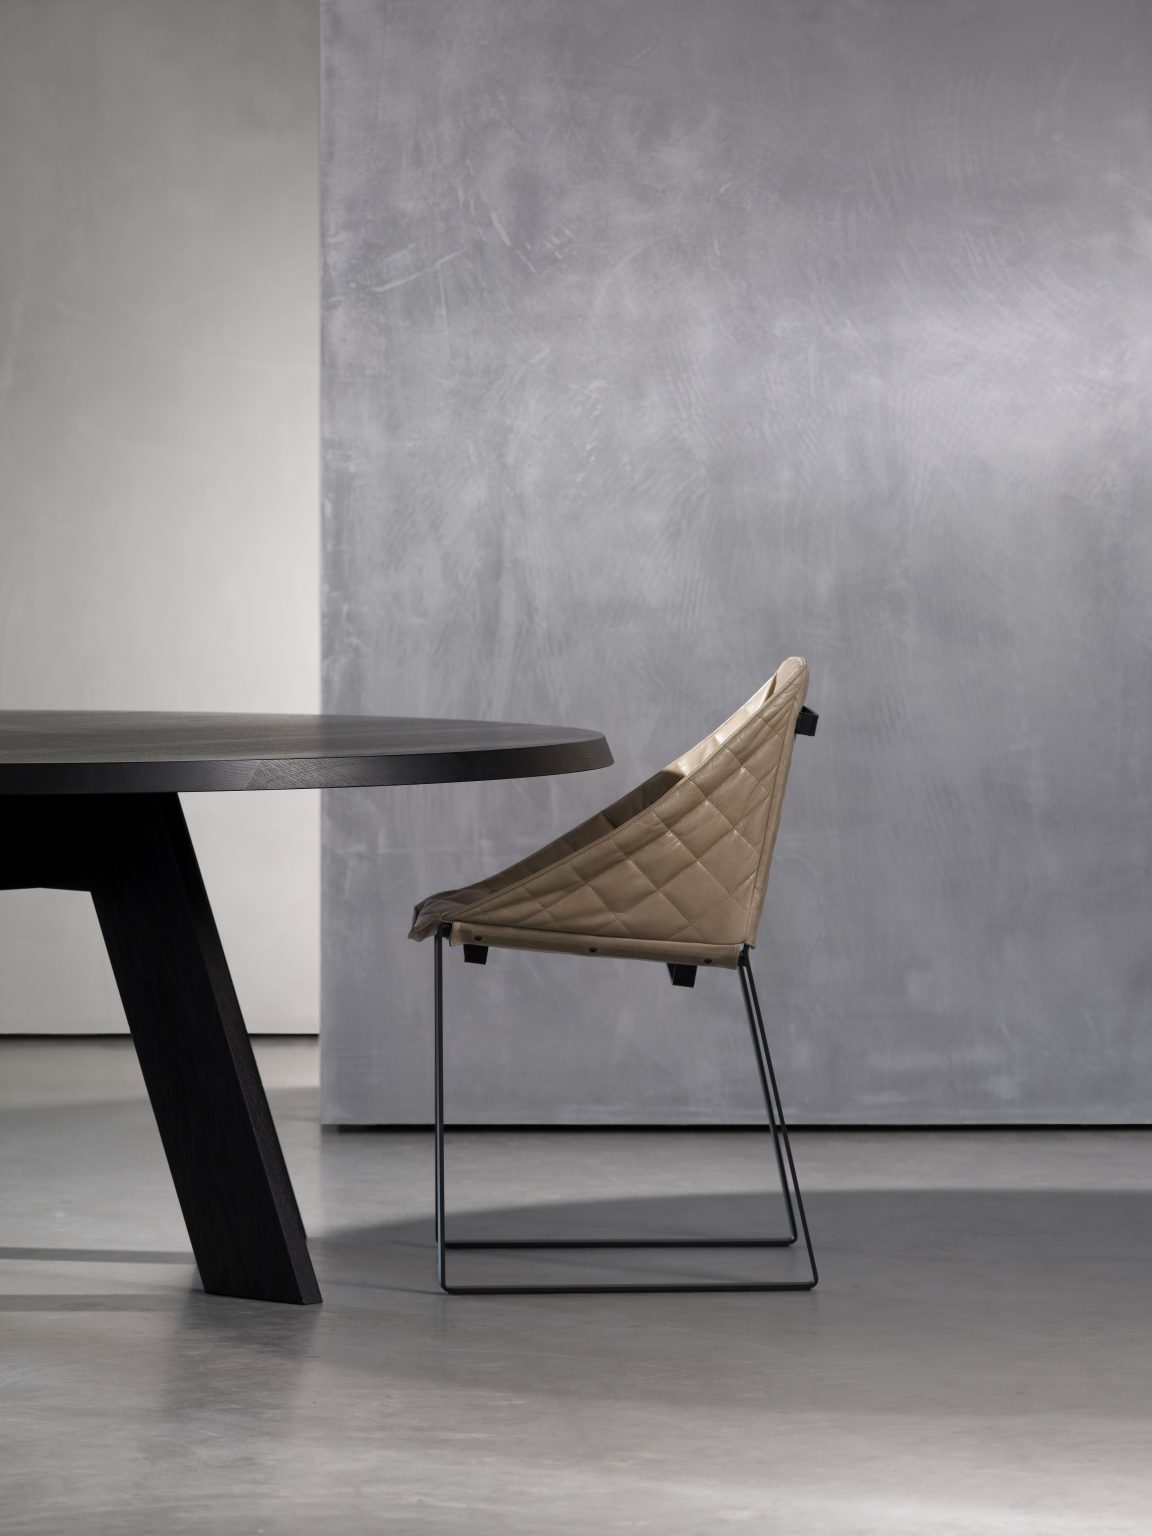 Biennale Interieur - Belgium's leading design and interior event - Pb_collection_kekke_chair_sa_011.jpg